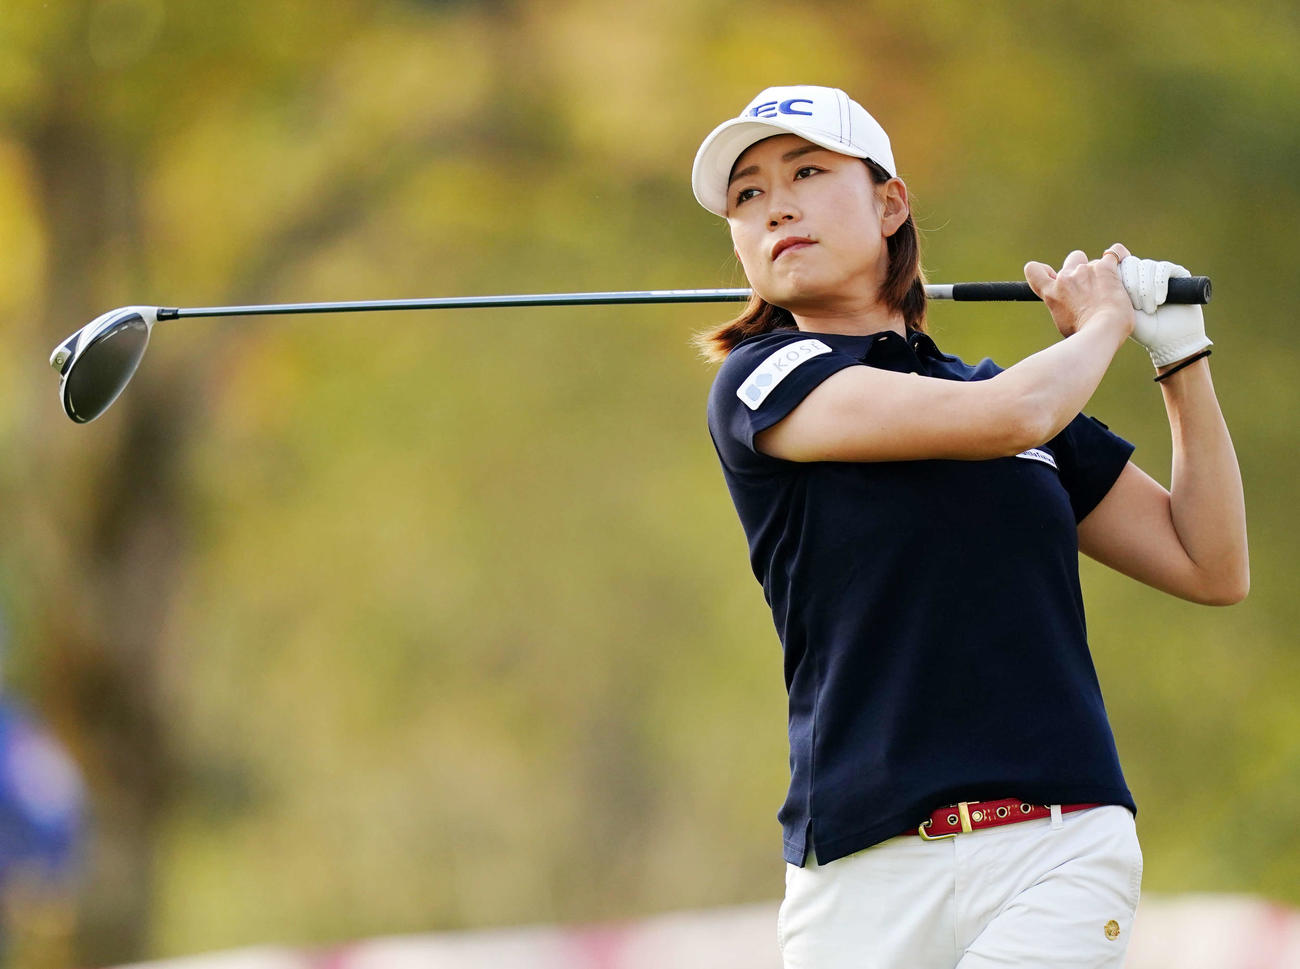 https://www.nikkansports.com/sports/golf/news/img/202104020000019-w1300_15.jpg